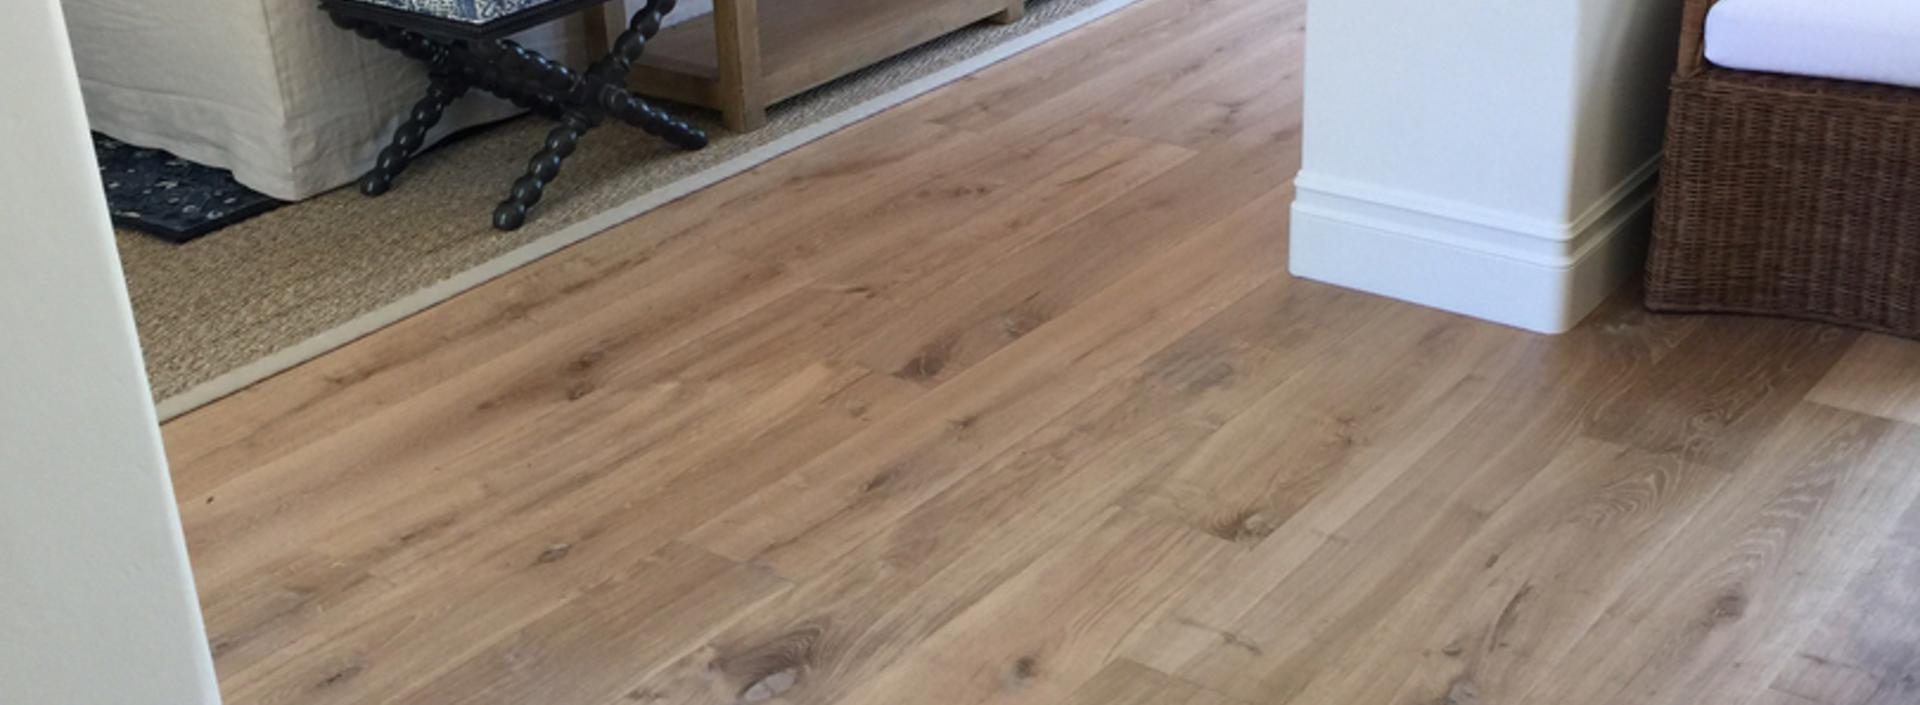 san diego laminate san diego refinishing san diego flooring san diego vinyl plank - Laminate Wood Flooring